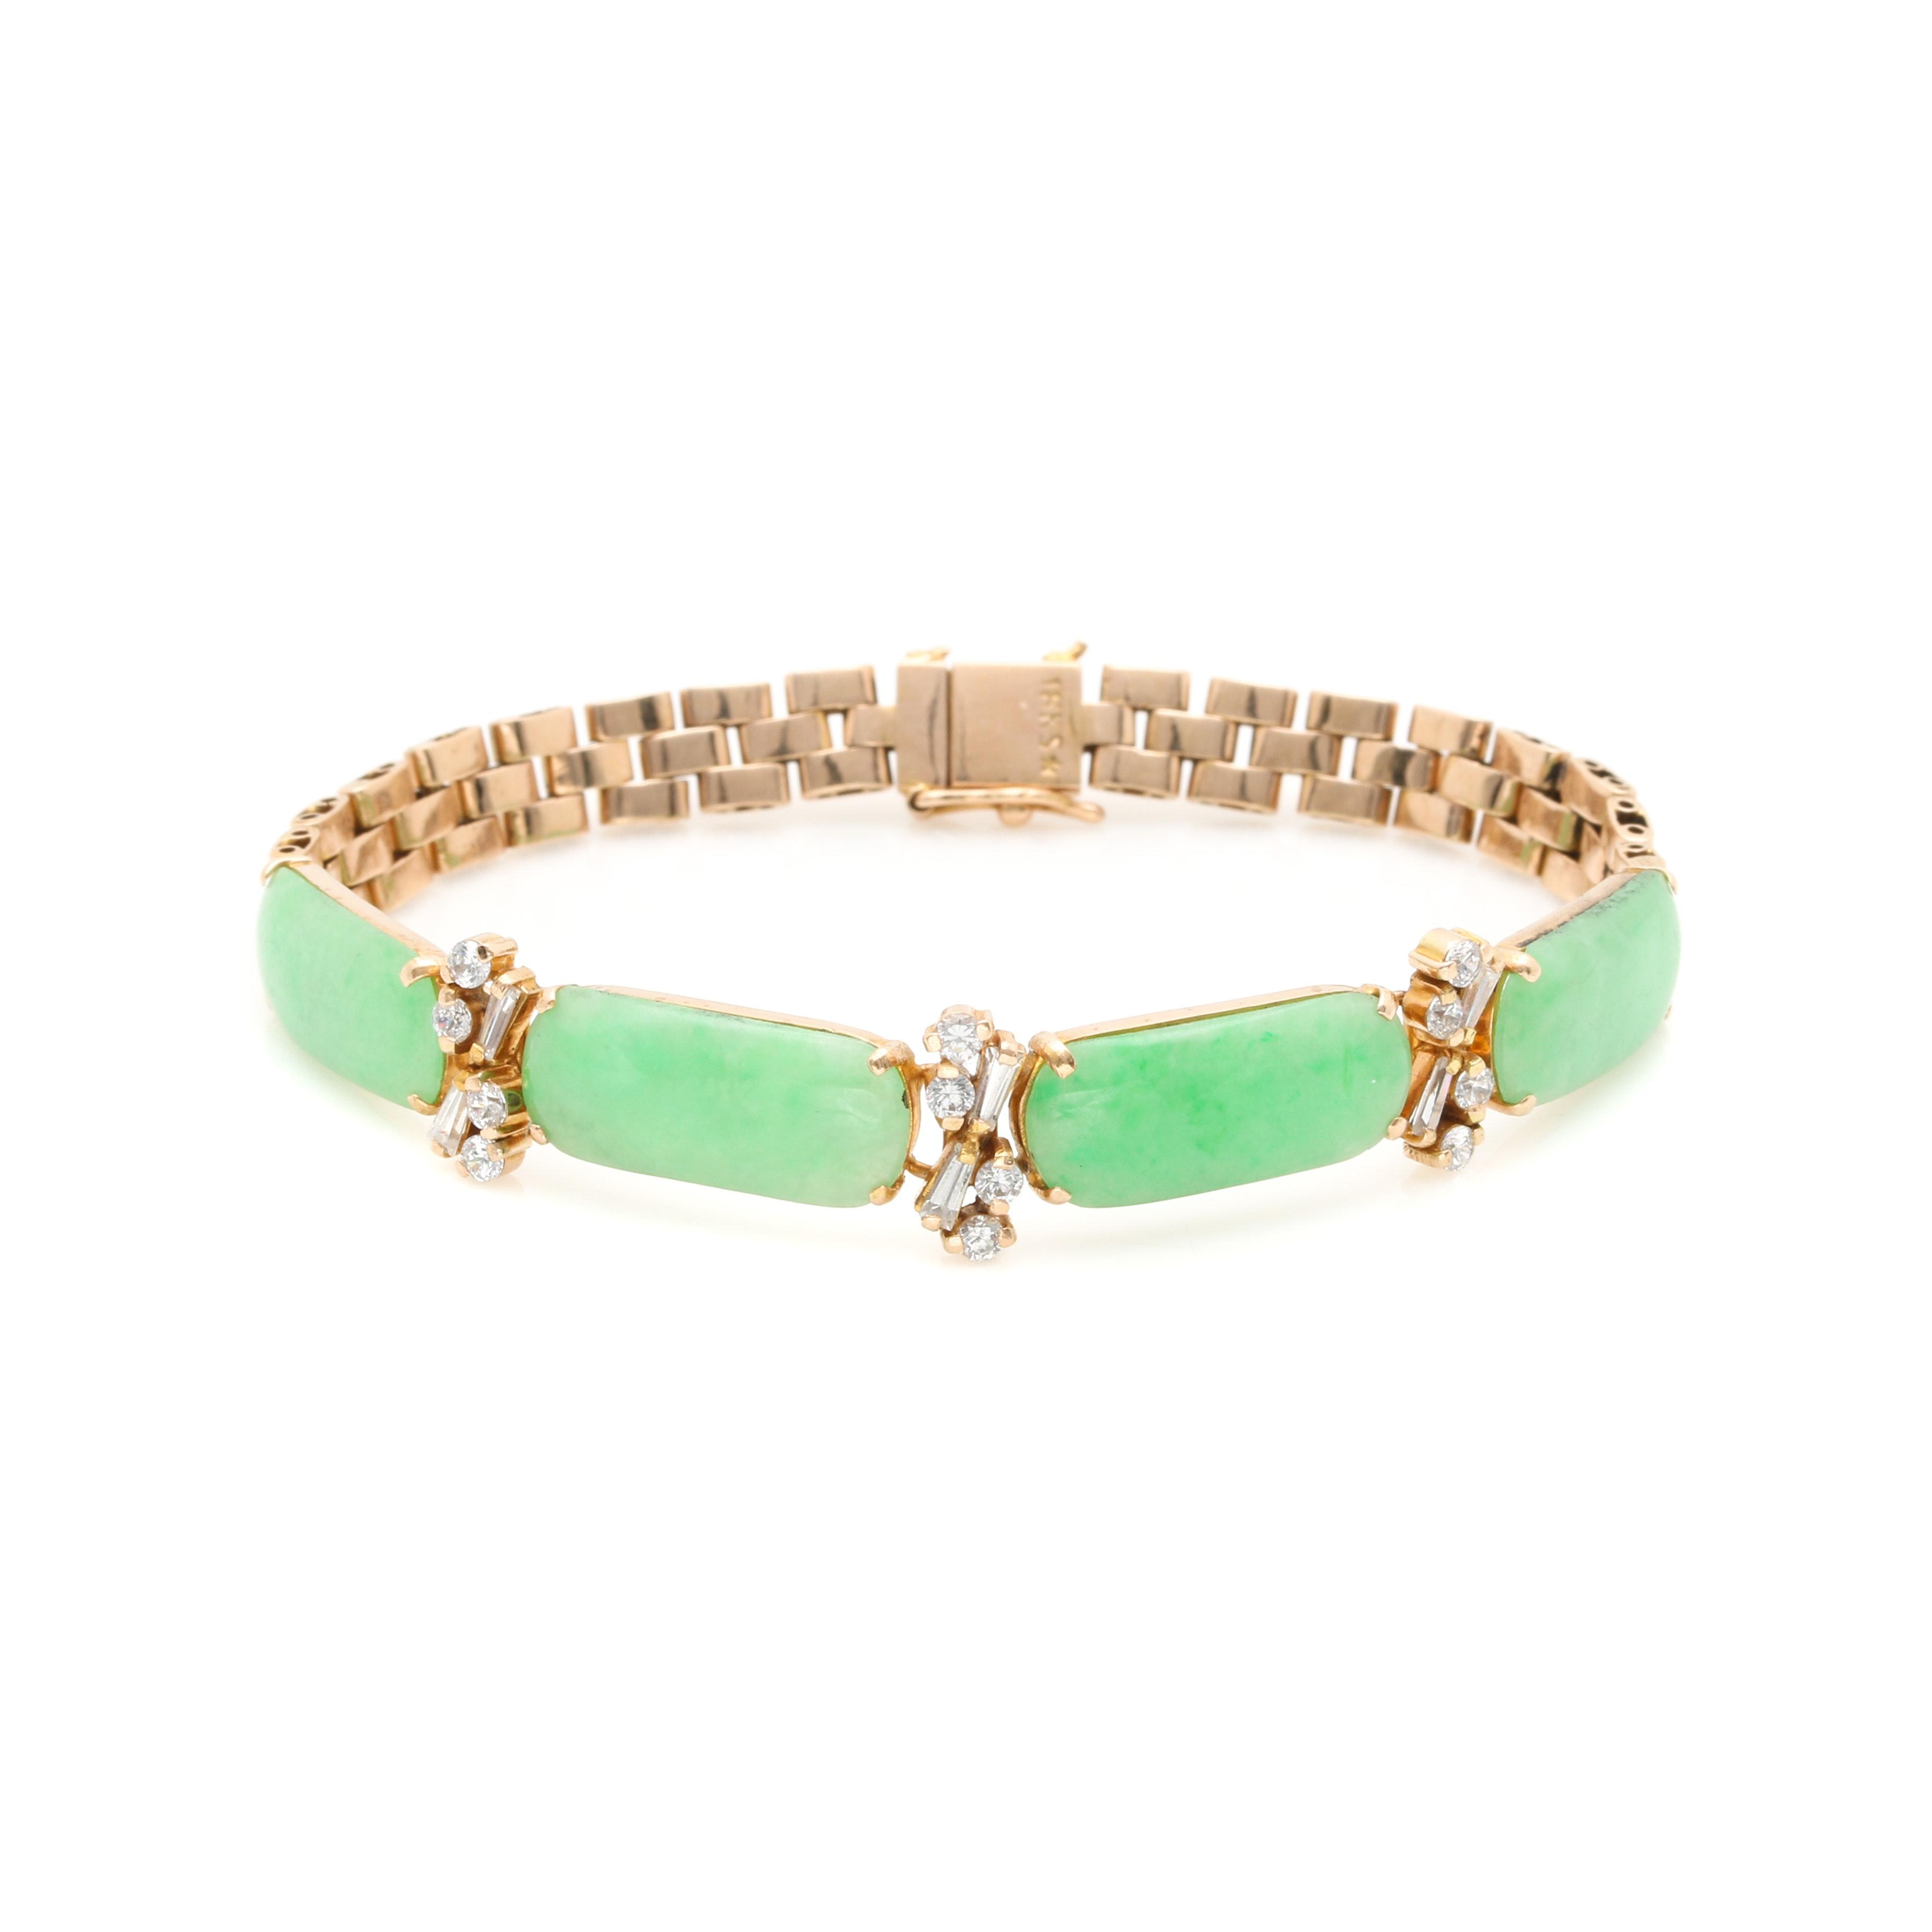 18K Yellow Gold Jadeite and Cubic Zirconia Bracelet